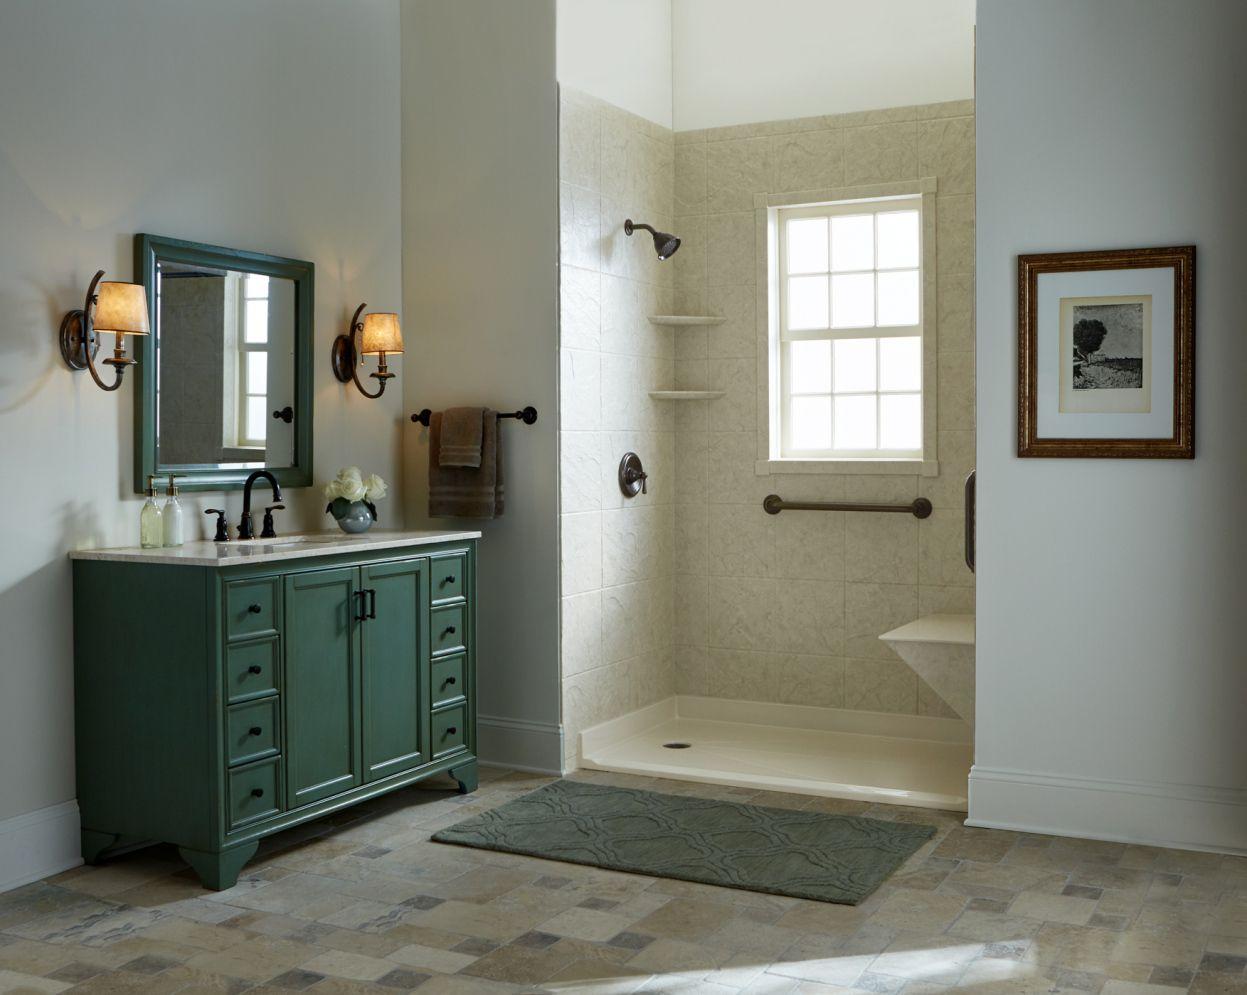 Bathroom Remodel Huntsville Al Interior House Paint Colors - Bathroom remodel huntsville al